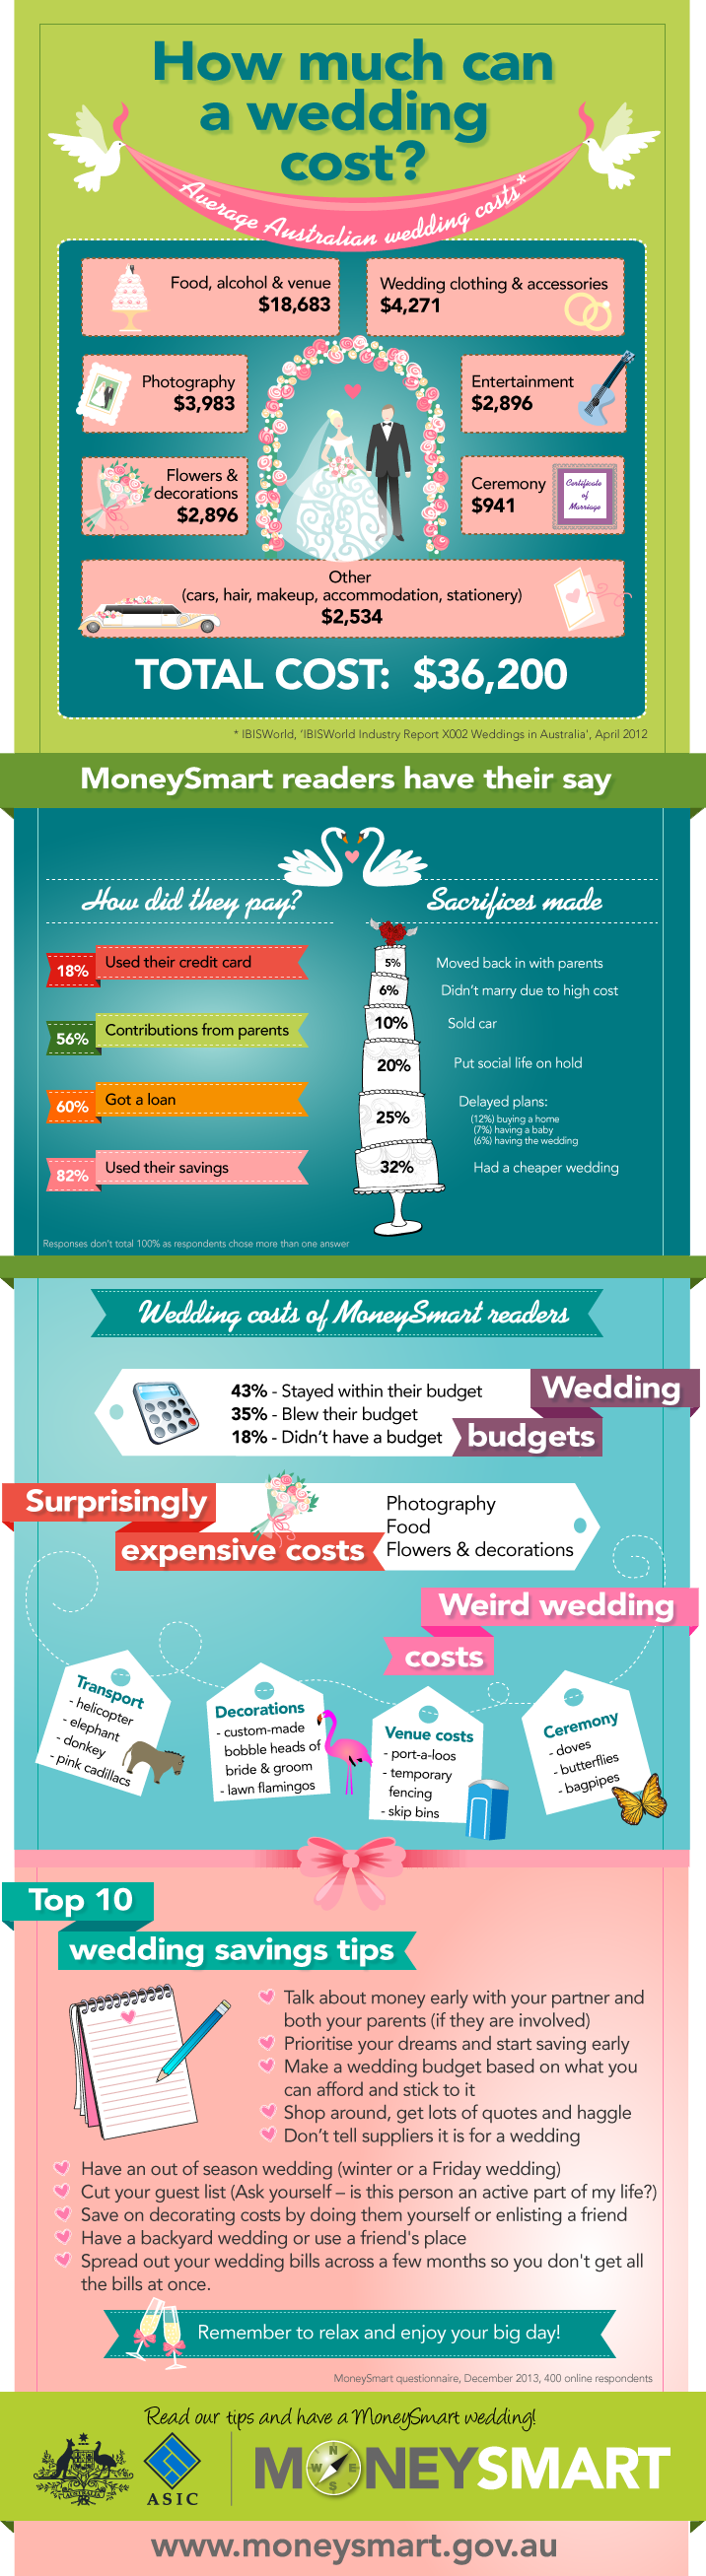 moneysmart-infographic-wedding-costs-9121744